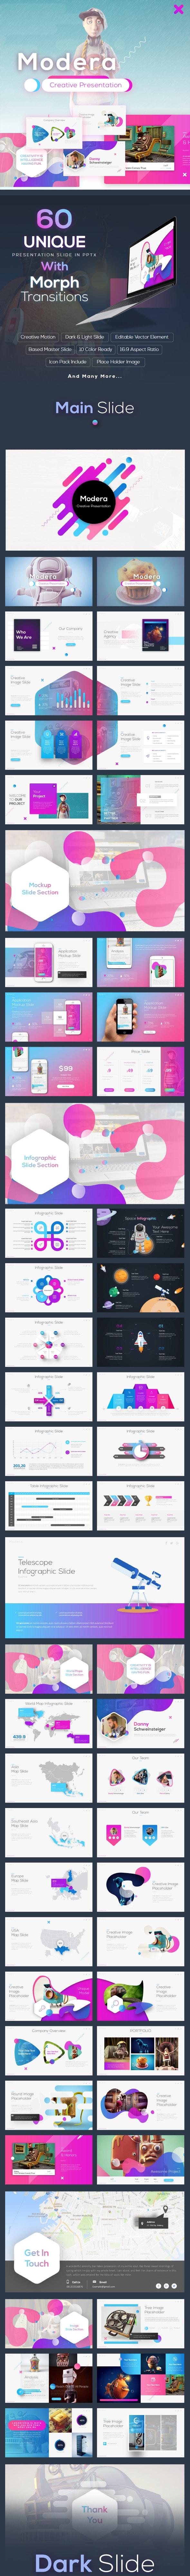 Modera - Creative Presentation - Business PowerPoint Templates